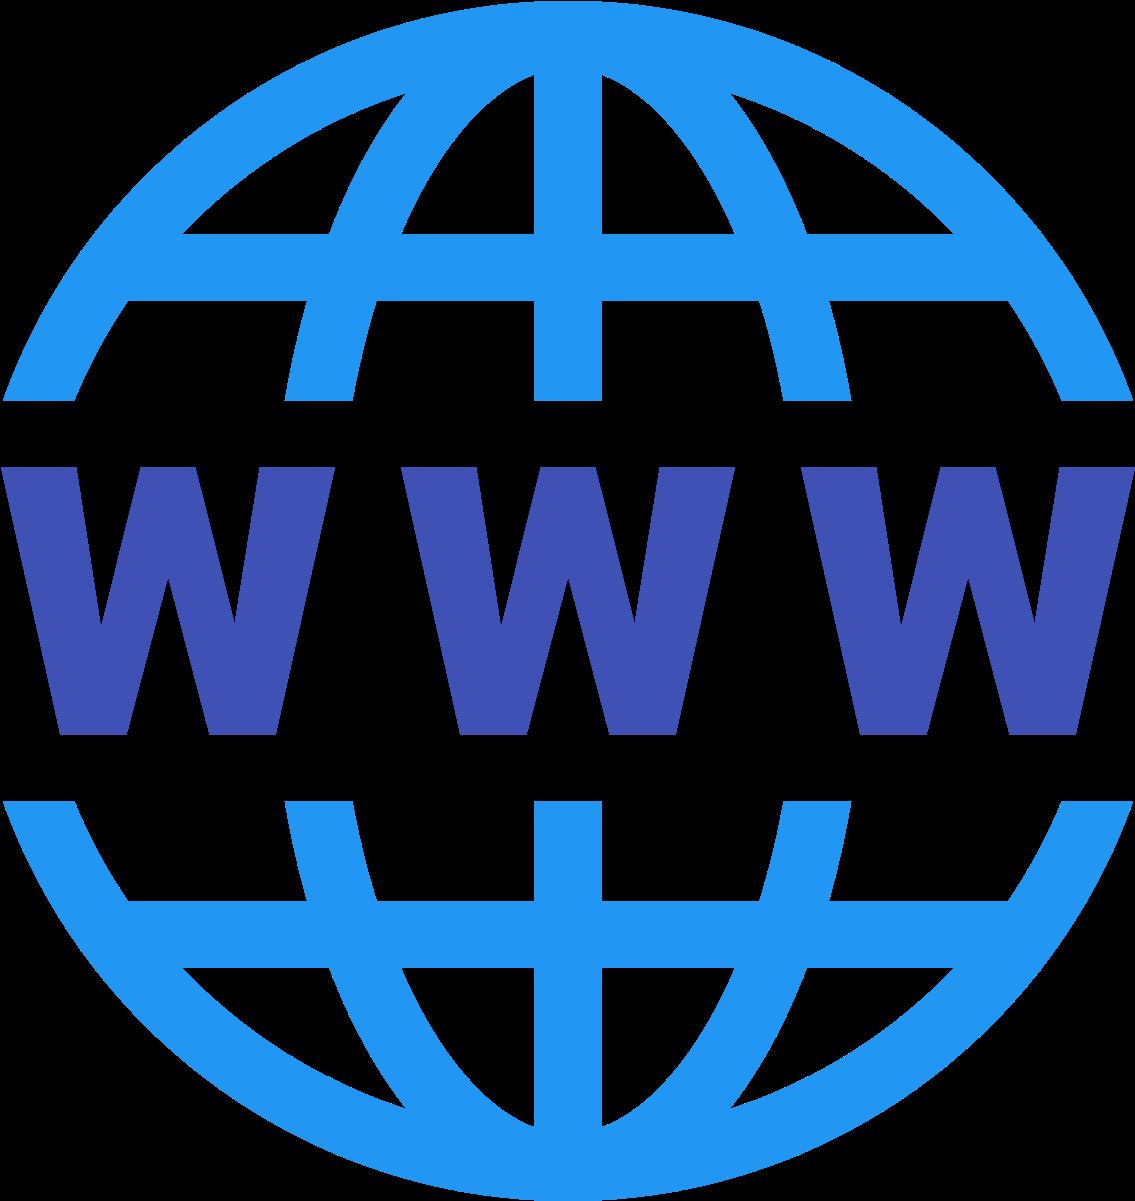 Internet Icon Png Website Logo Png Transparent Background 80094 Vippng